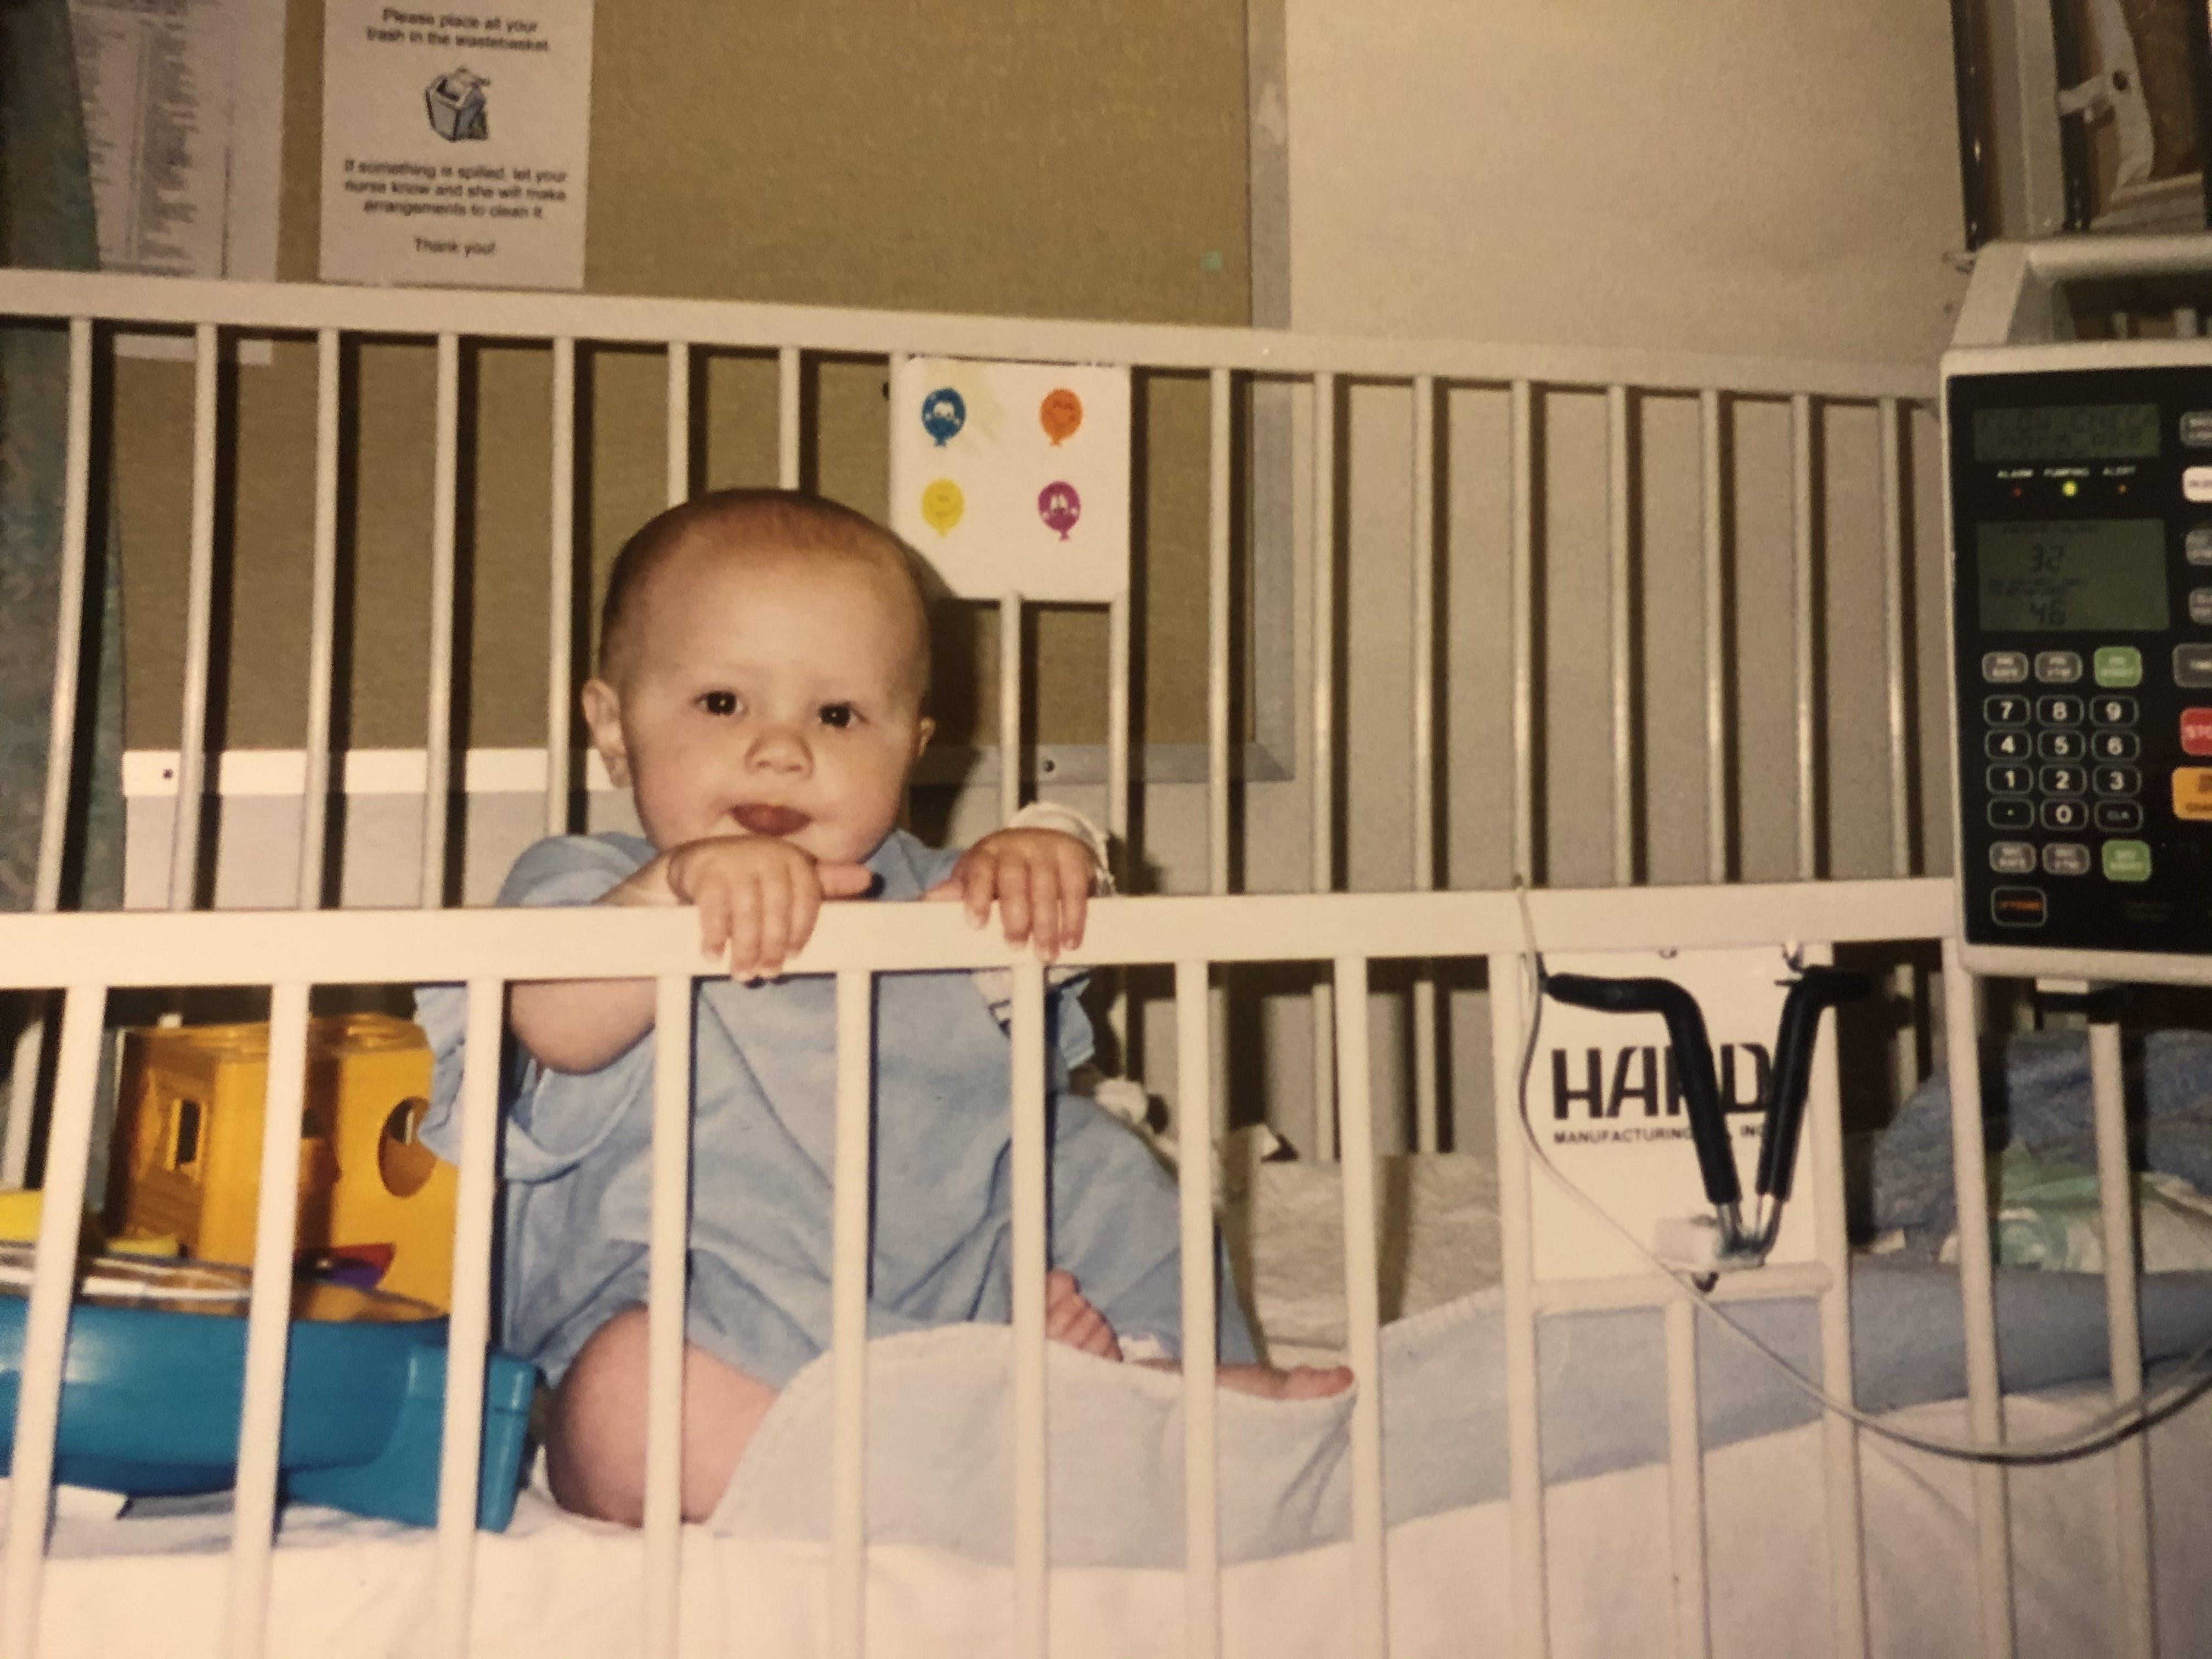 baby in hospital crib